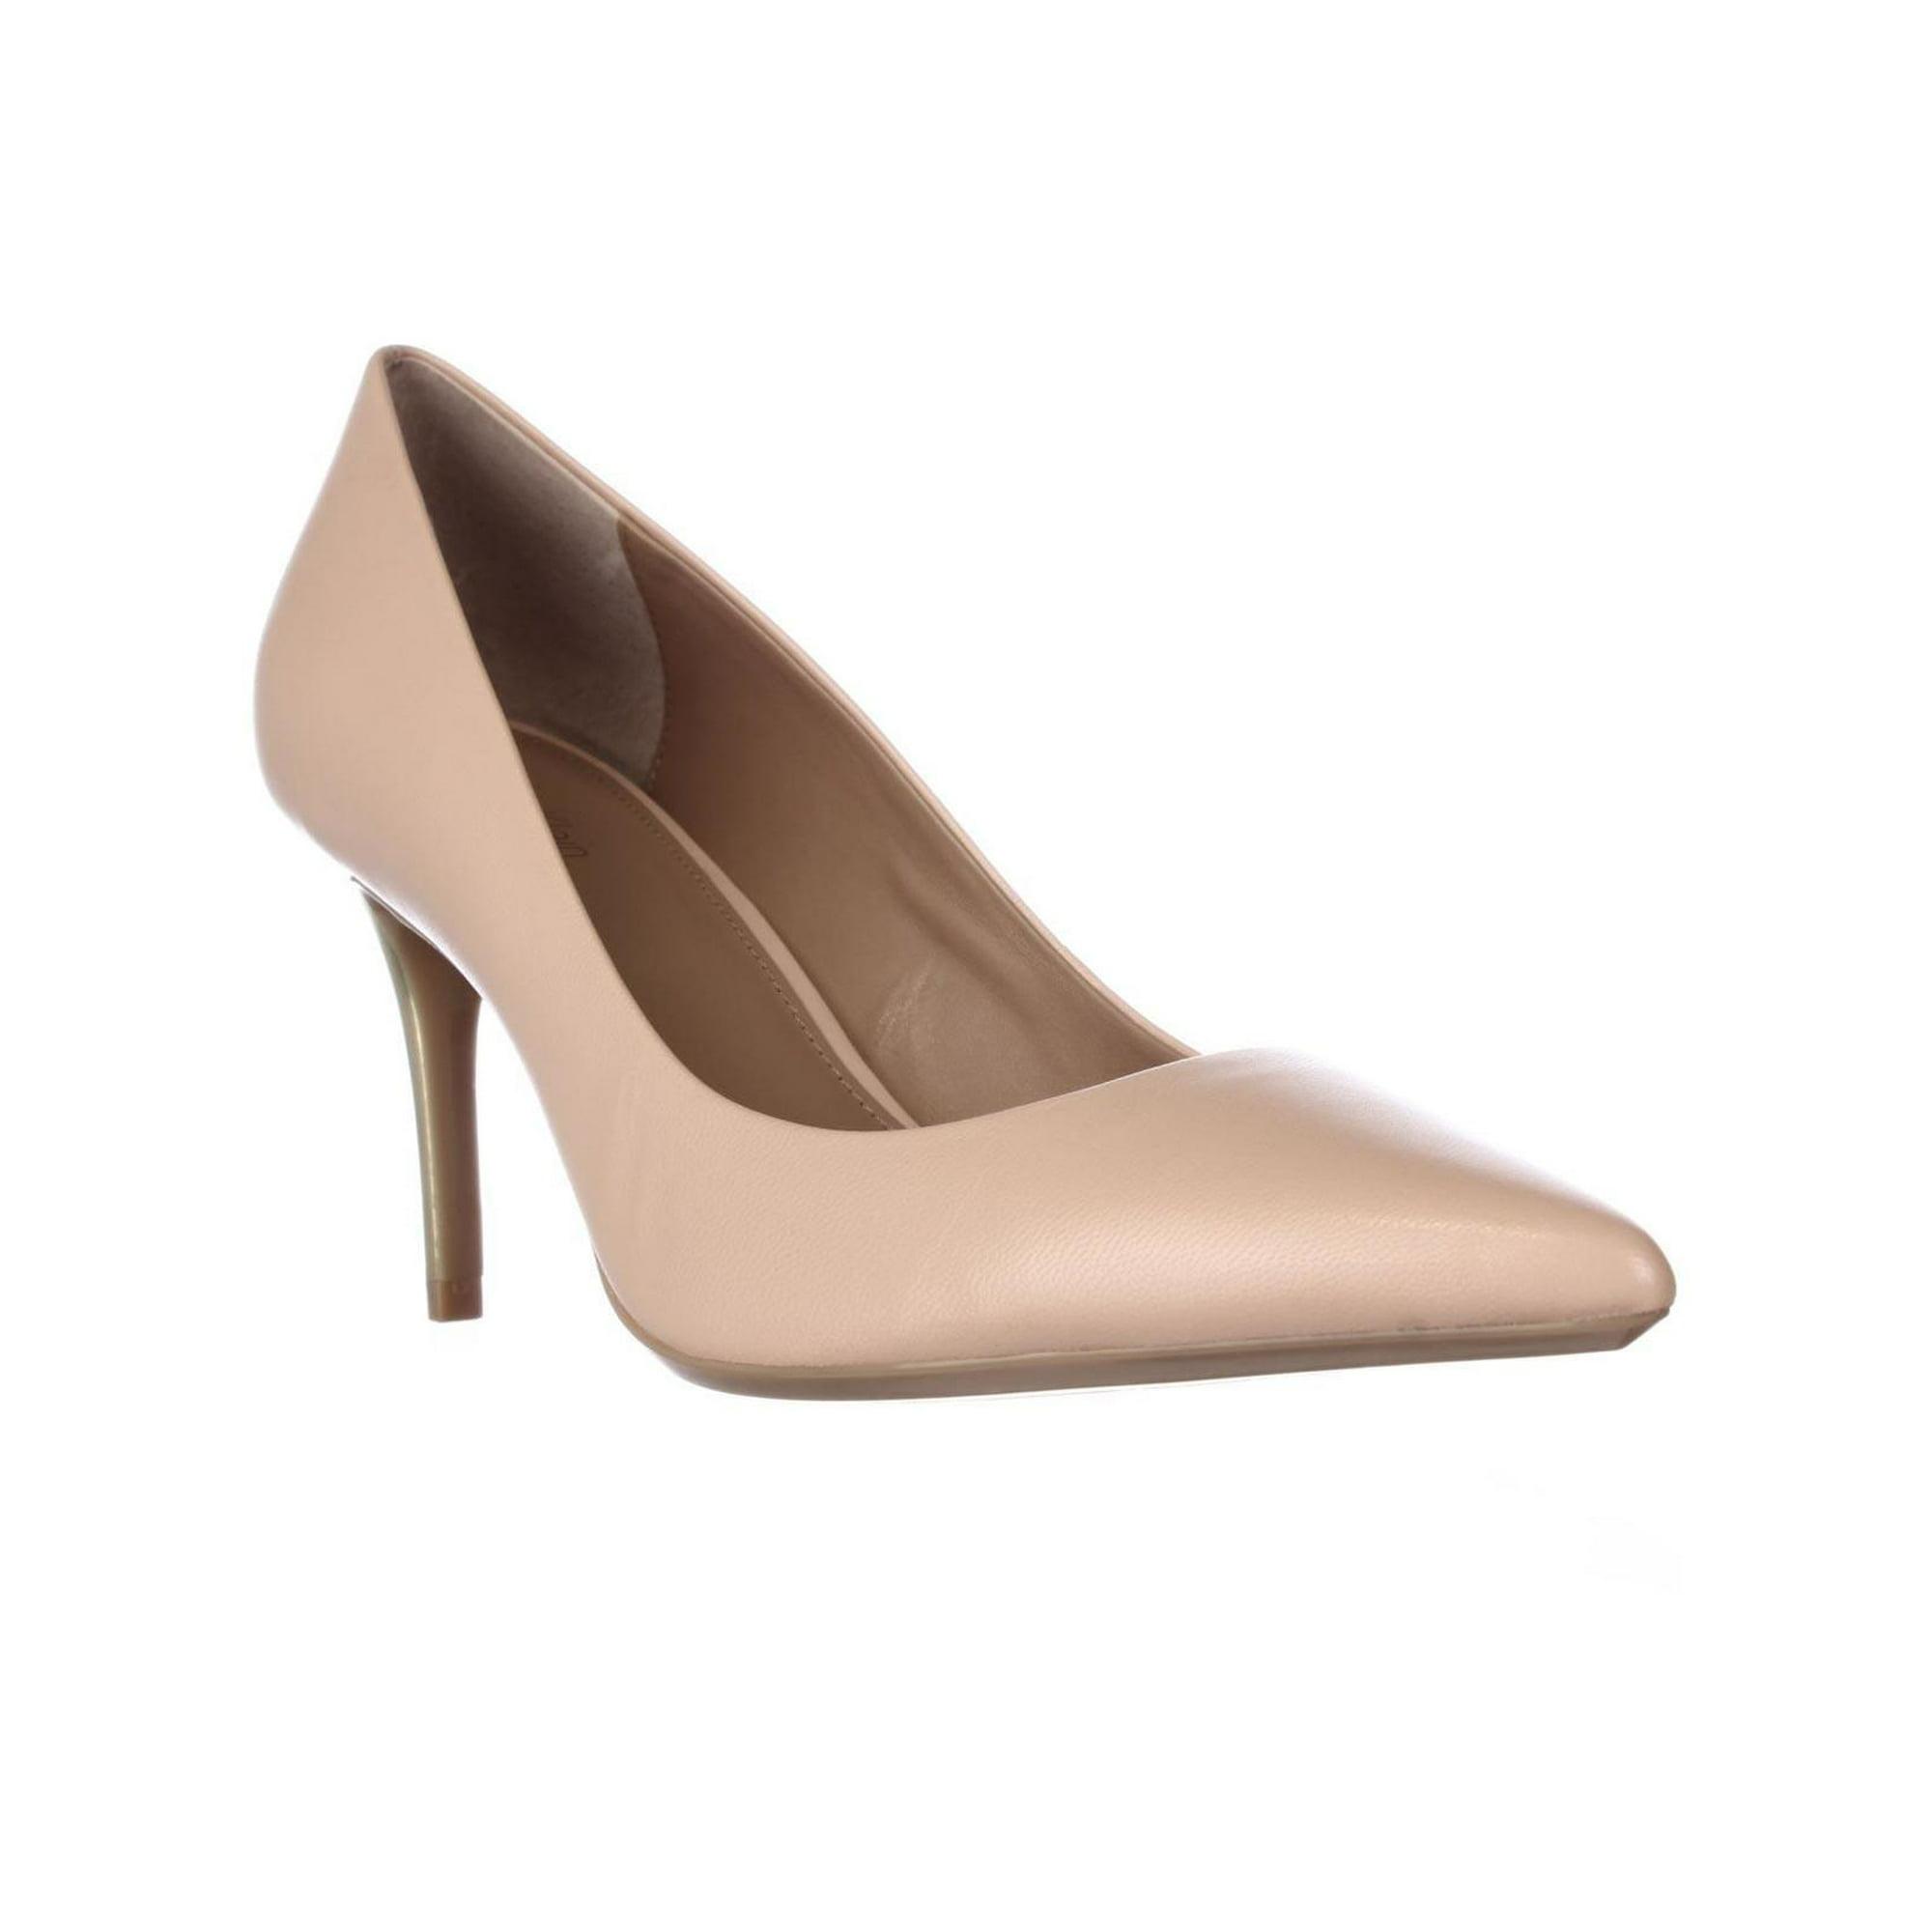 16fbc986754 Calvin Klein Womens Gayle Pointed Toe Classic Pumps